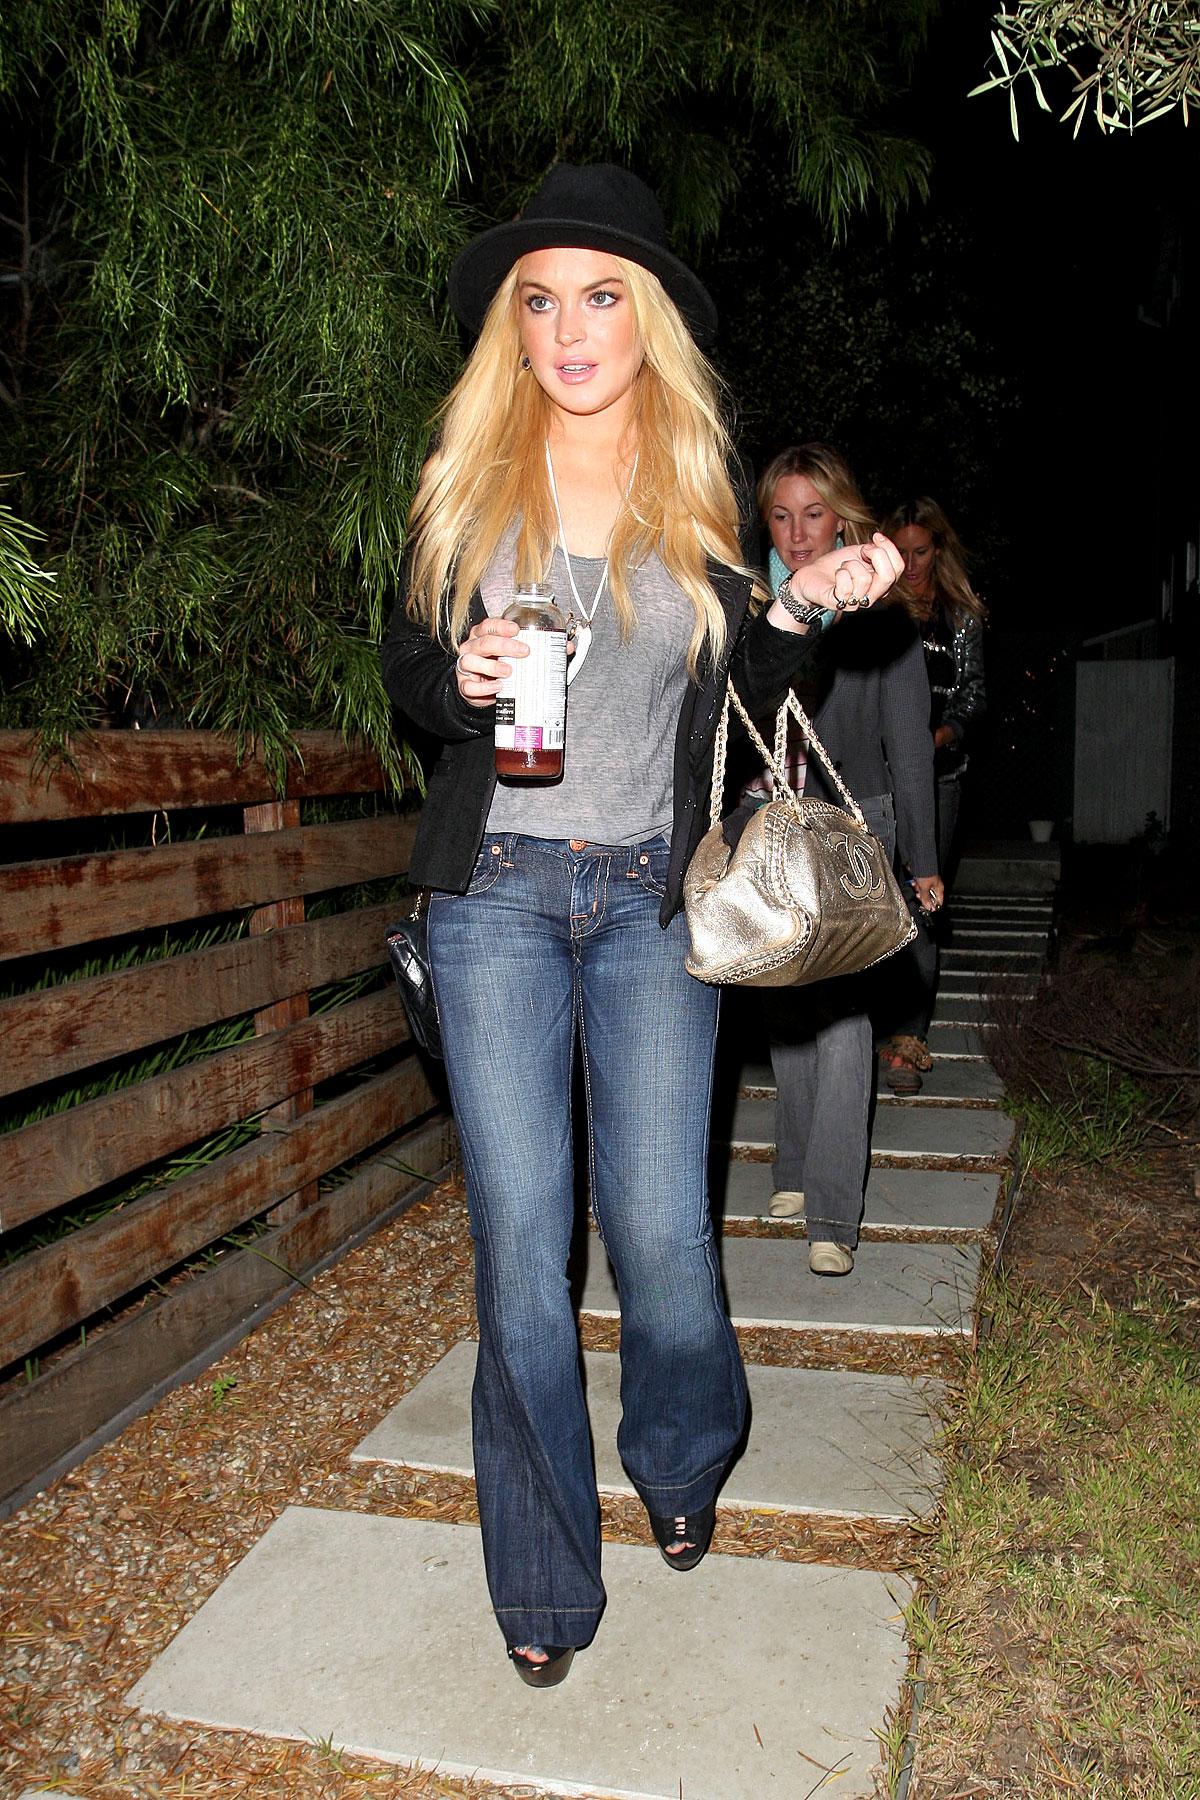 Lindsay Lohan Hides Ankle Bracelet With Ugly Jeans (PHOTOS)